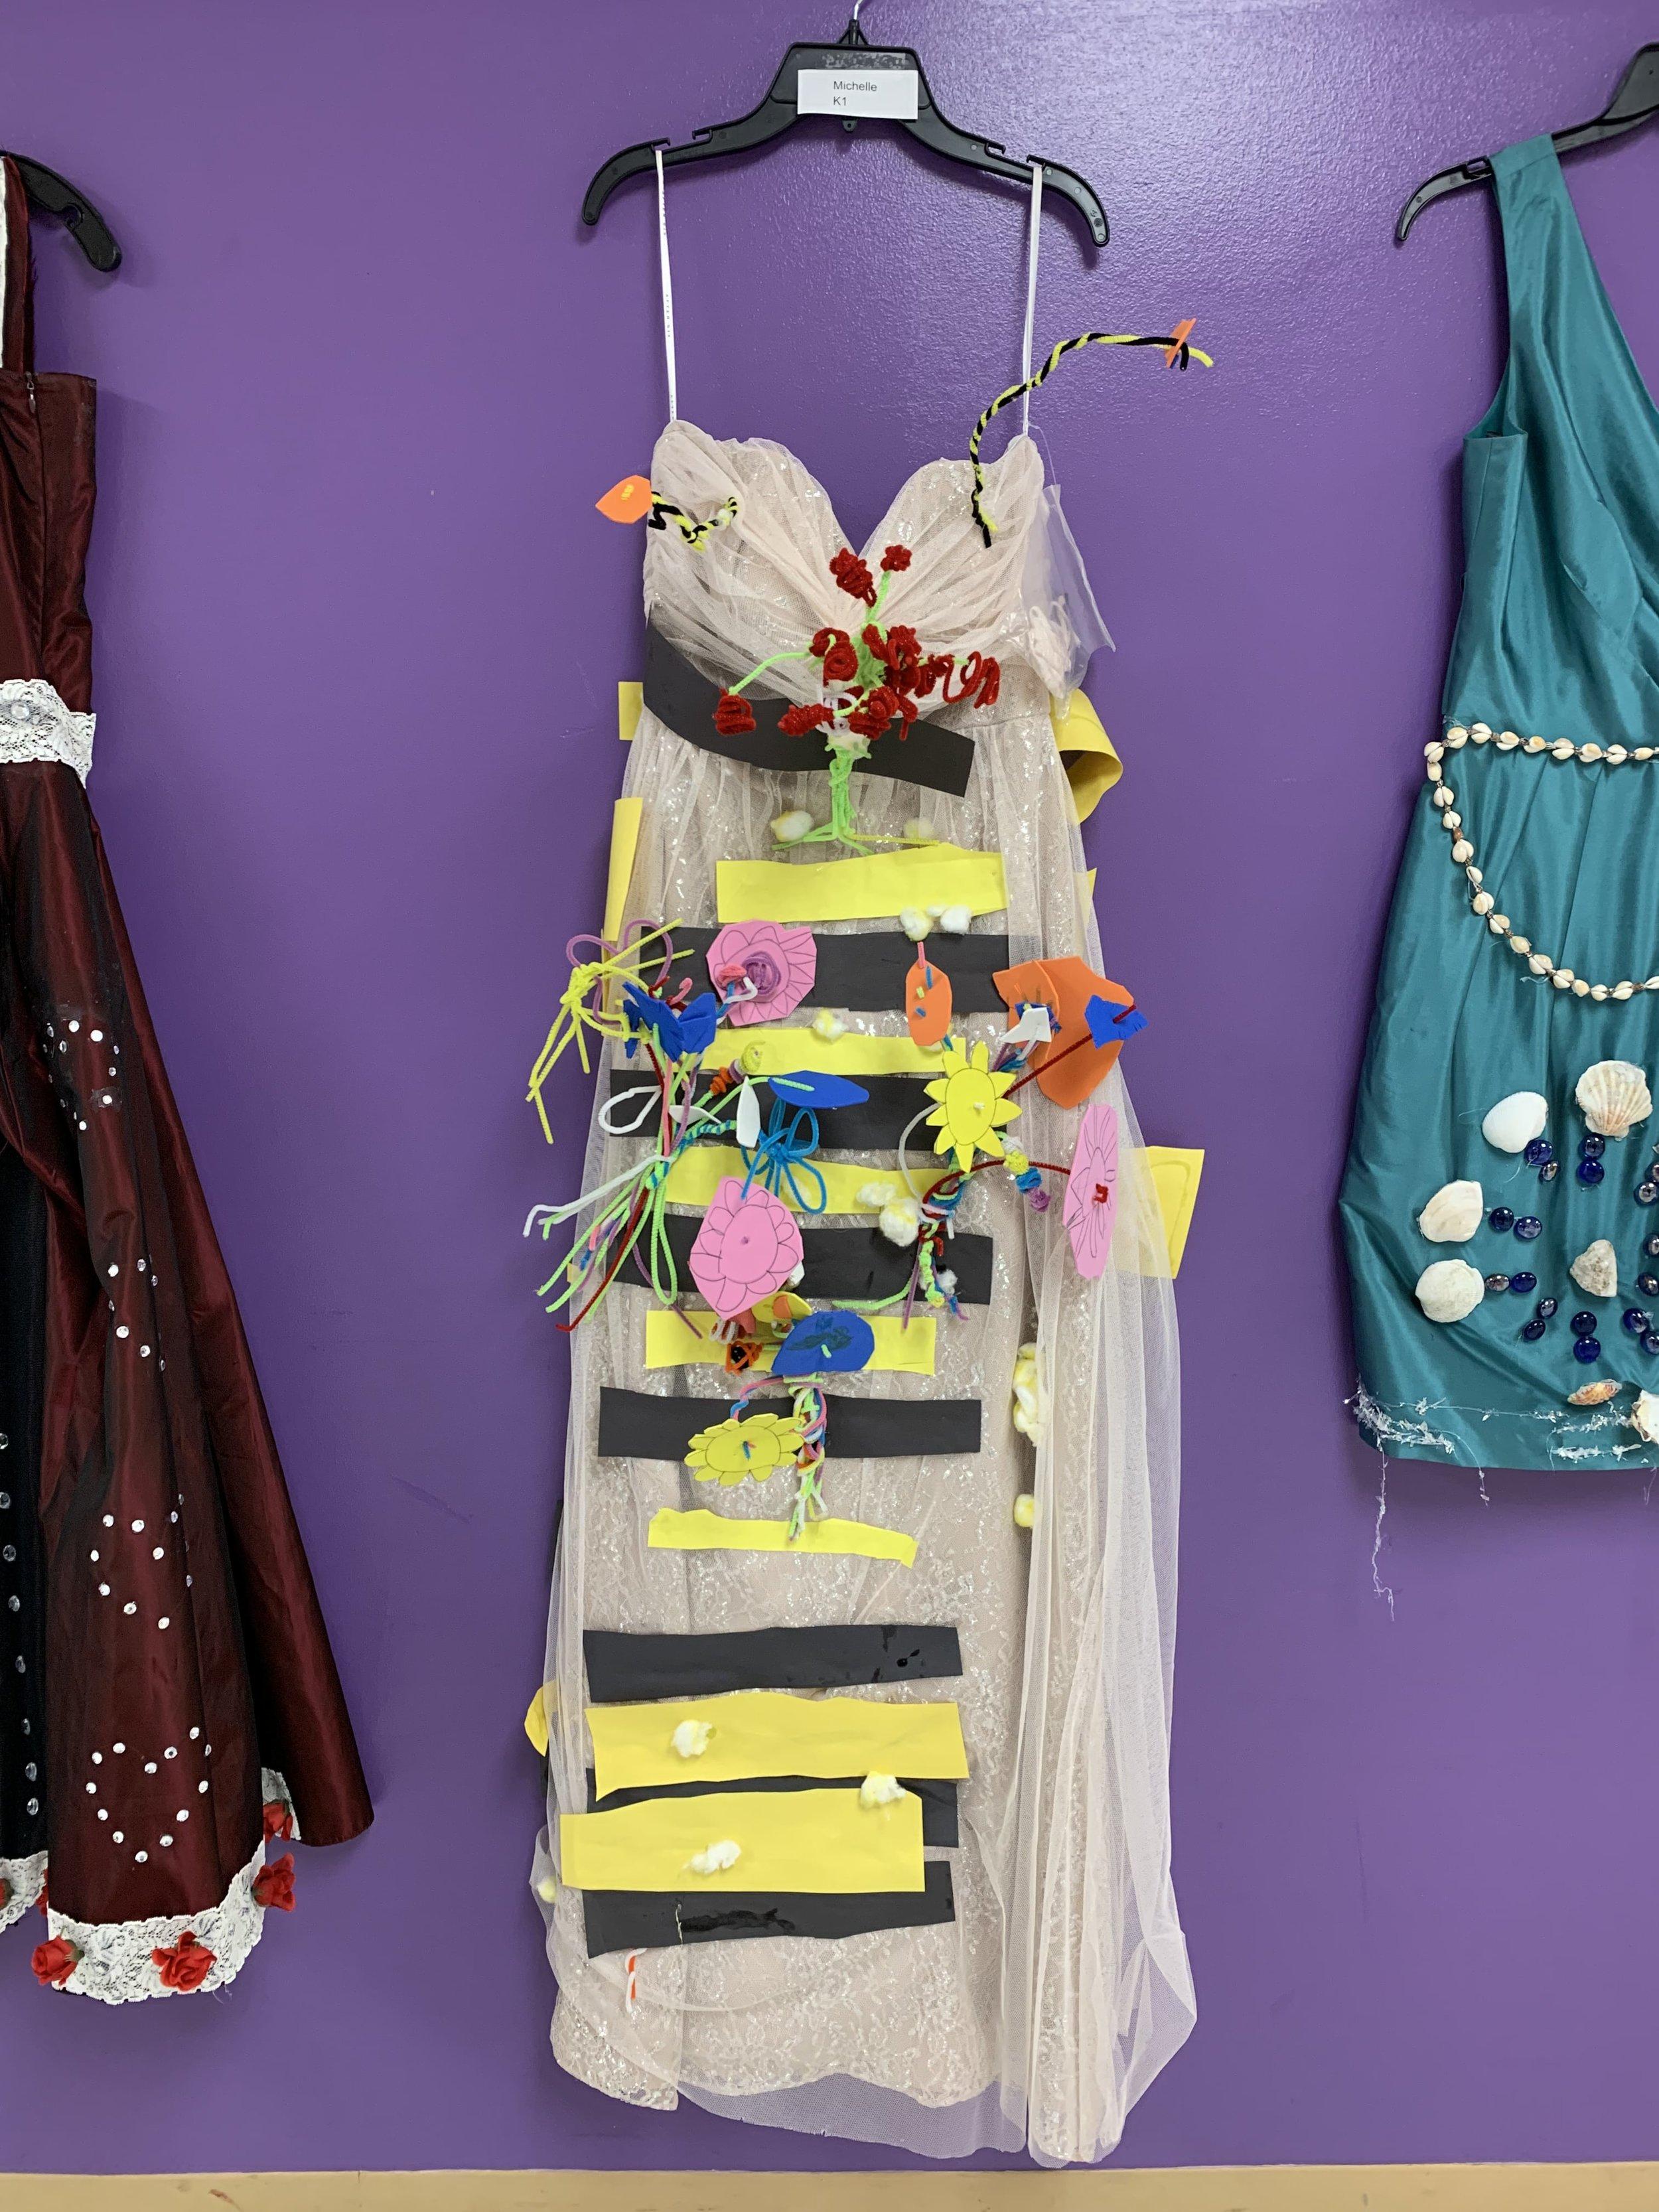 Columbus Ohio elementary school uses old sample dresses to study art